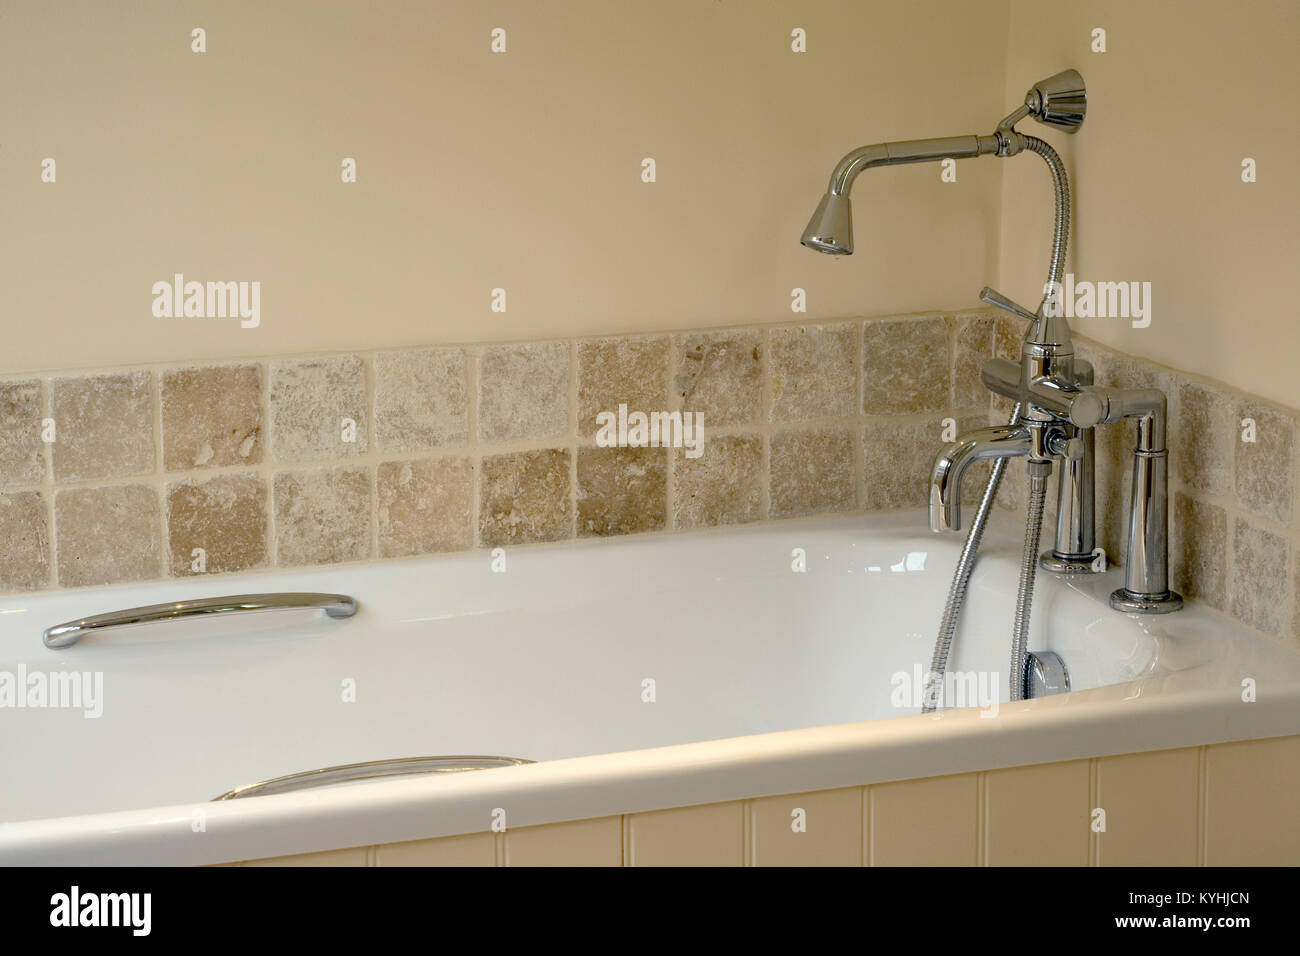 Showhome bathroom, brand new bath taps and shower head Stock Photo ...